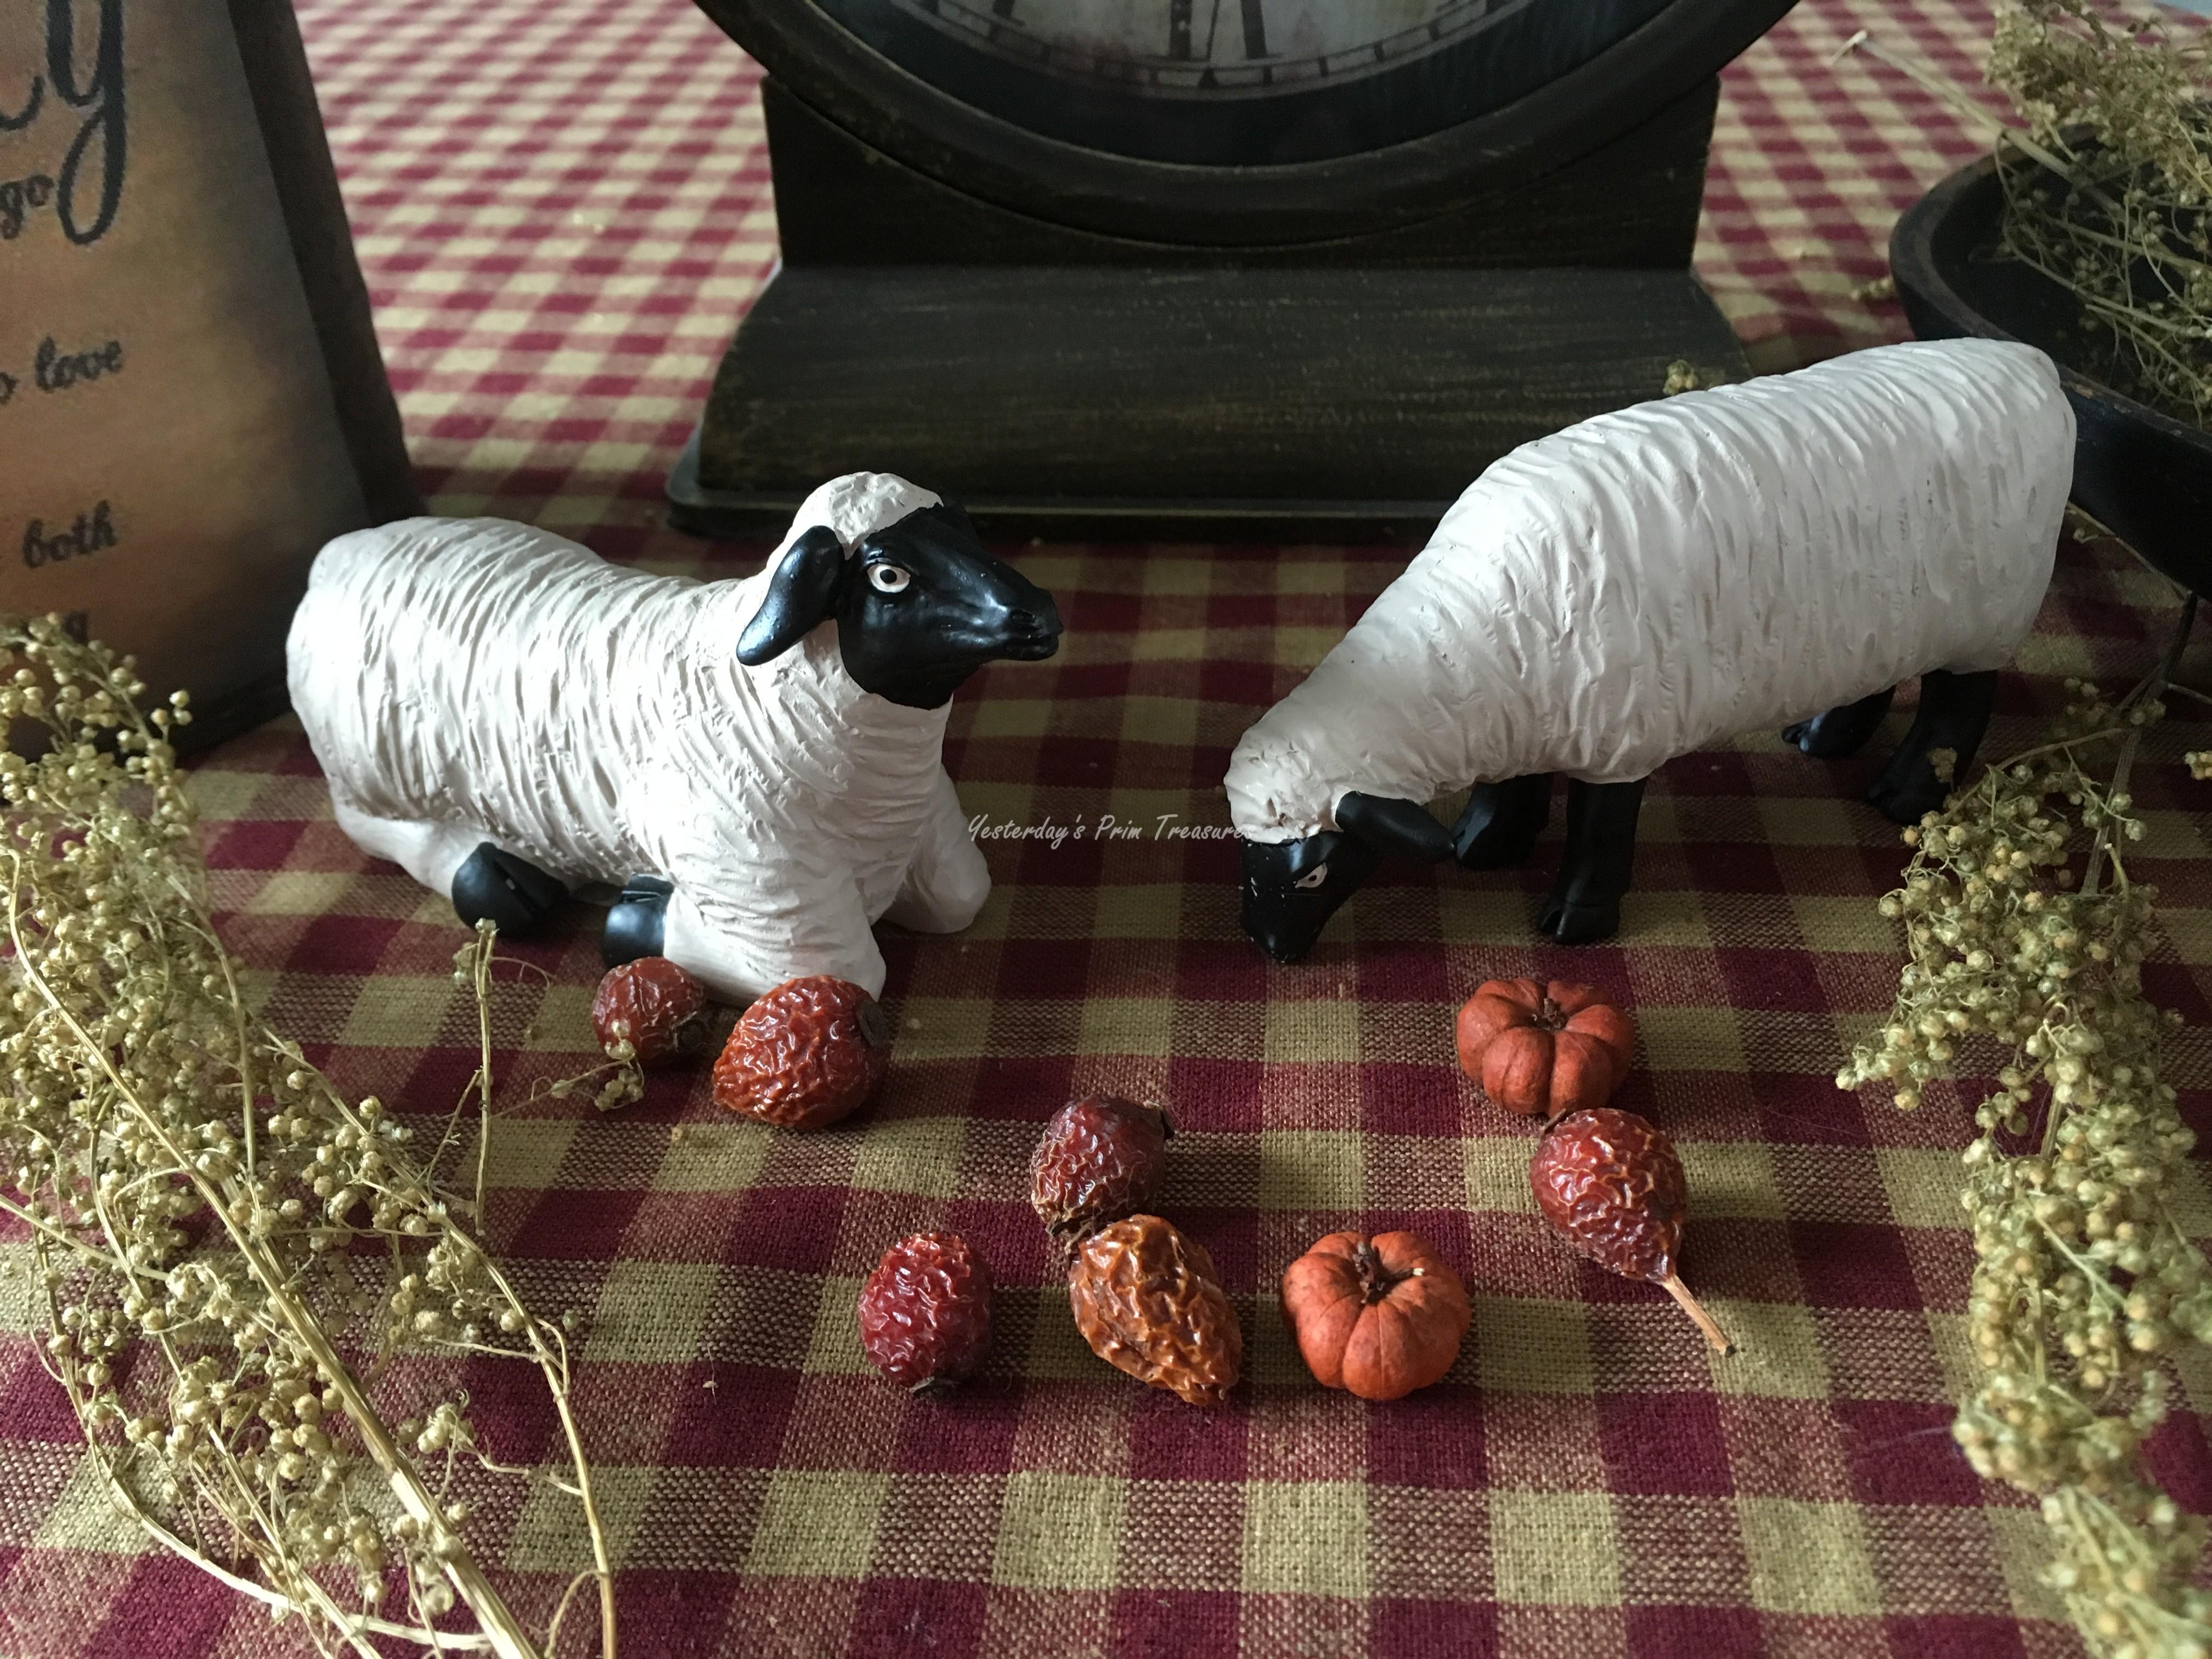 Primitive* Blossom Bucket* Sheep with Wreath /& Star* Shelf Sitter* Ornies*